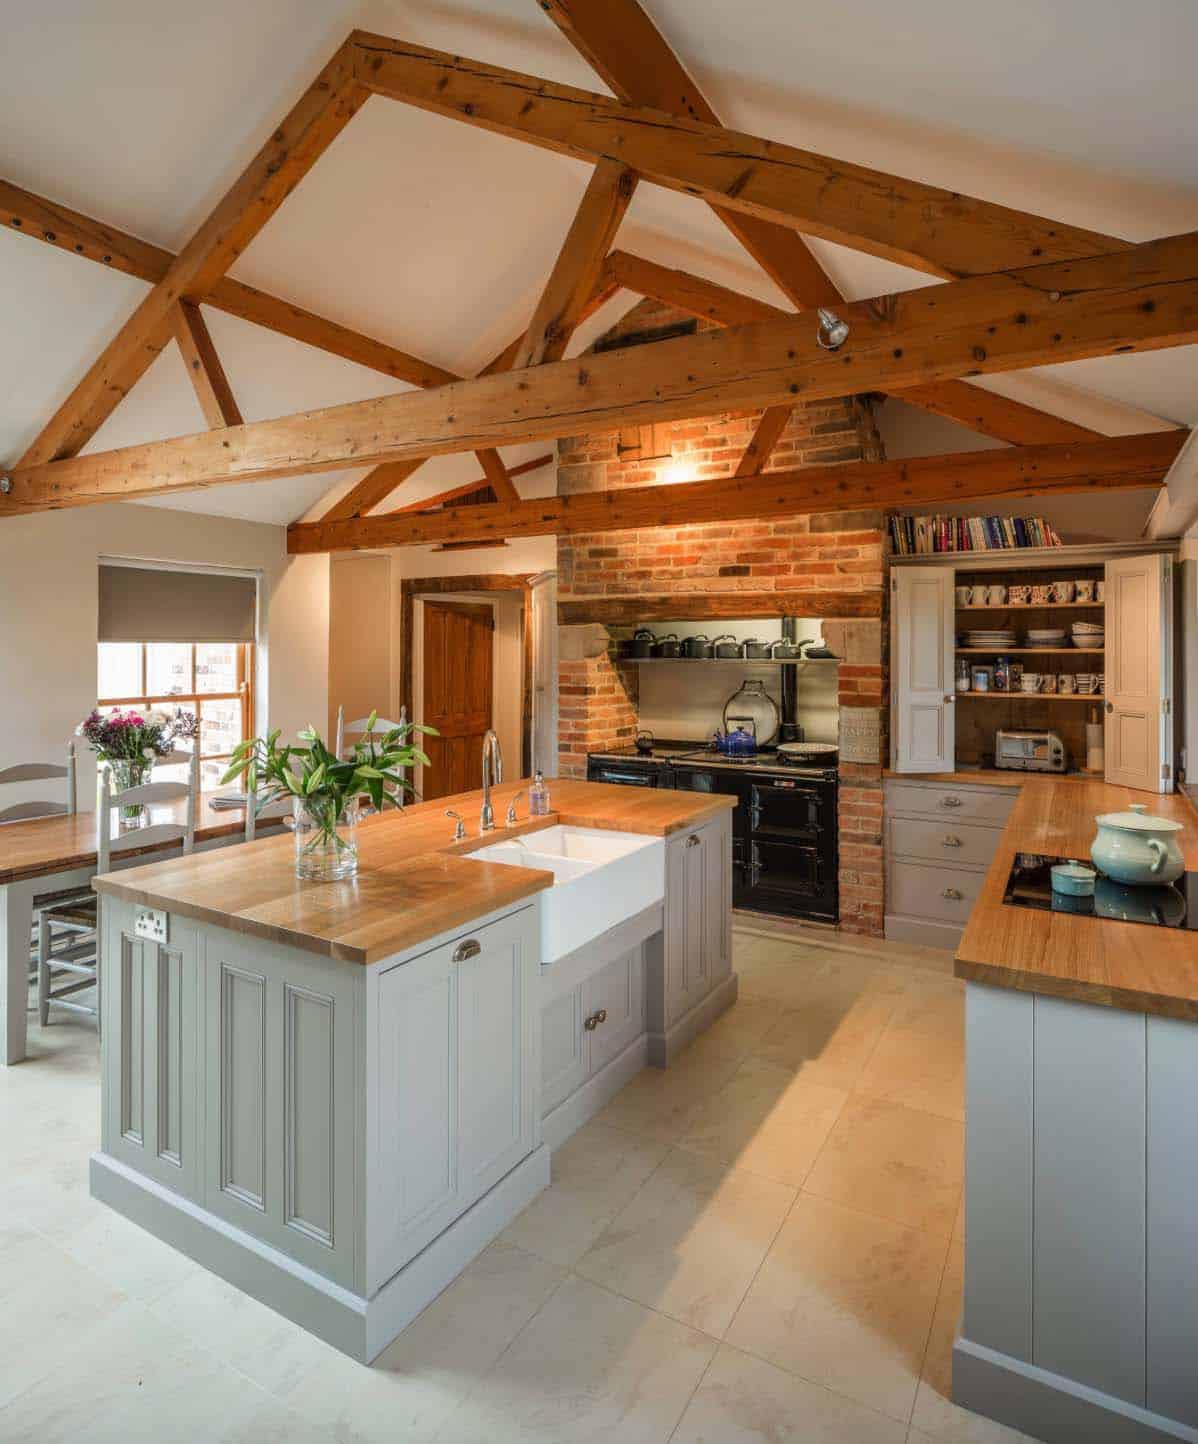 35+ Amazingly creative and stylish farmhouse kitchen ideas on Farmhouse Kitchen Ideas  id=46727